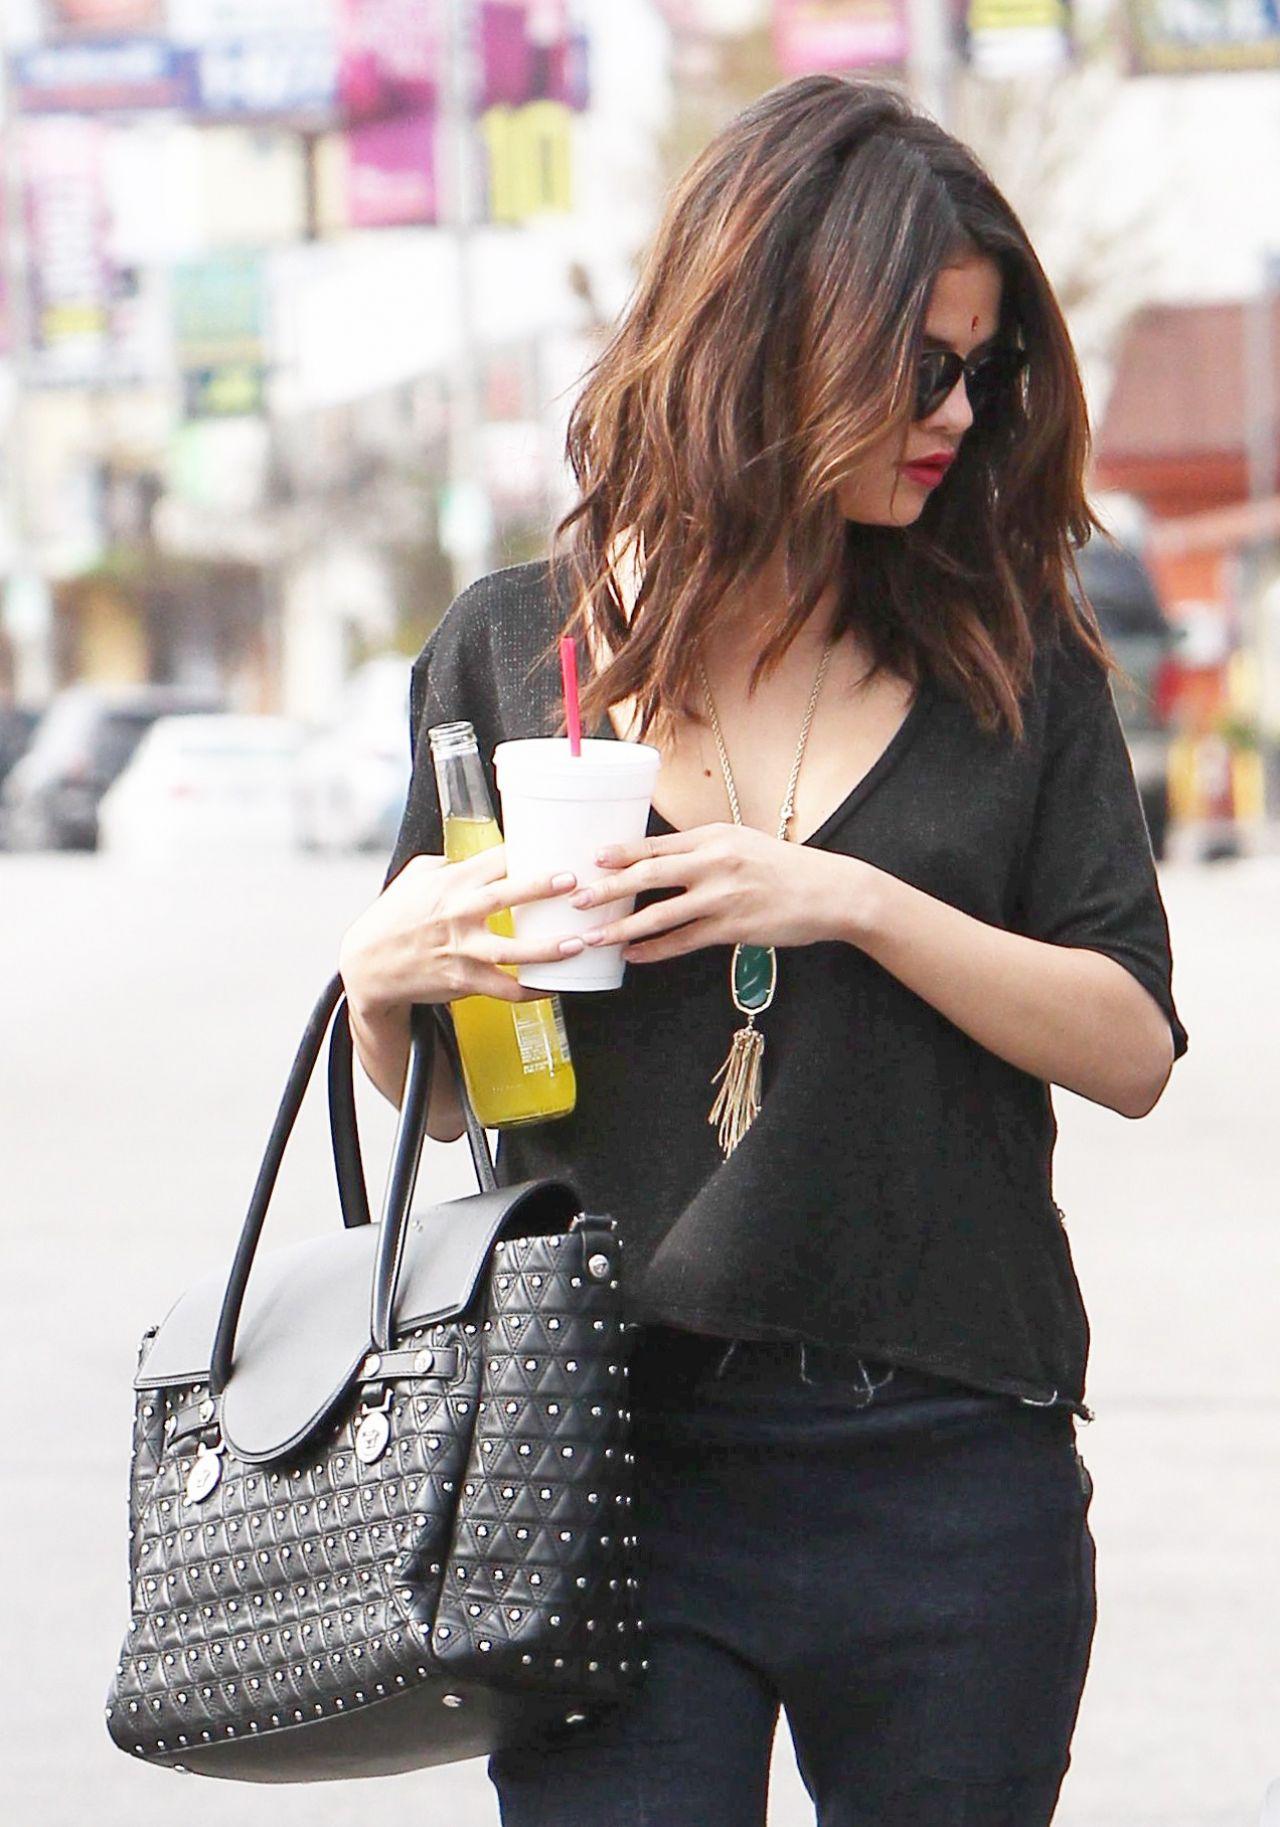 Selena gomez street style in a shredded shirt january 2014 - Photo selena gomez 2014 ...